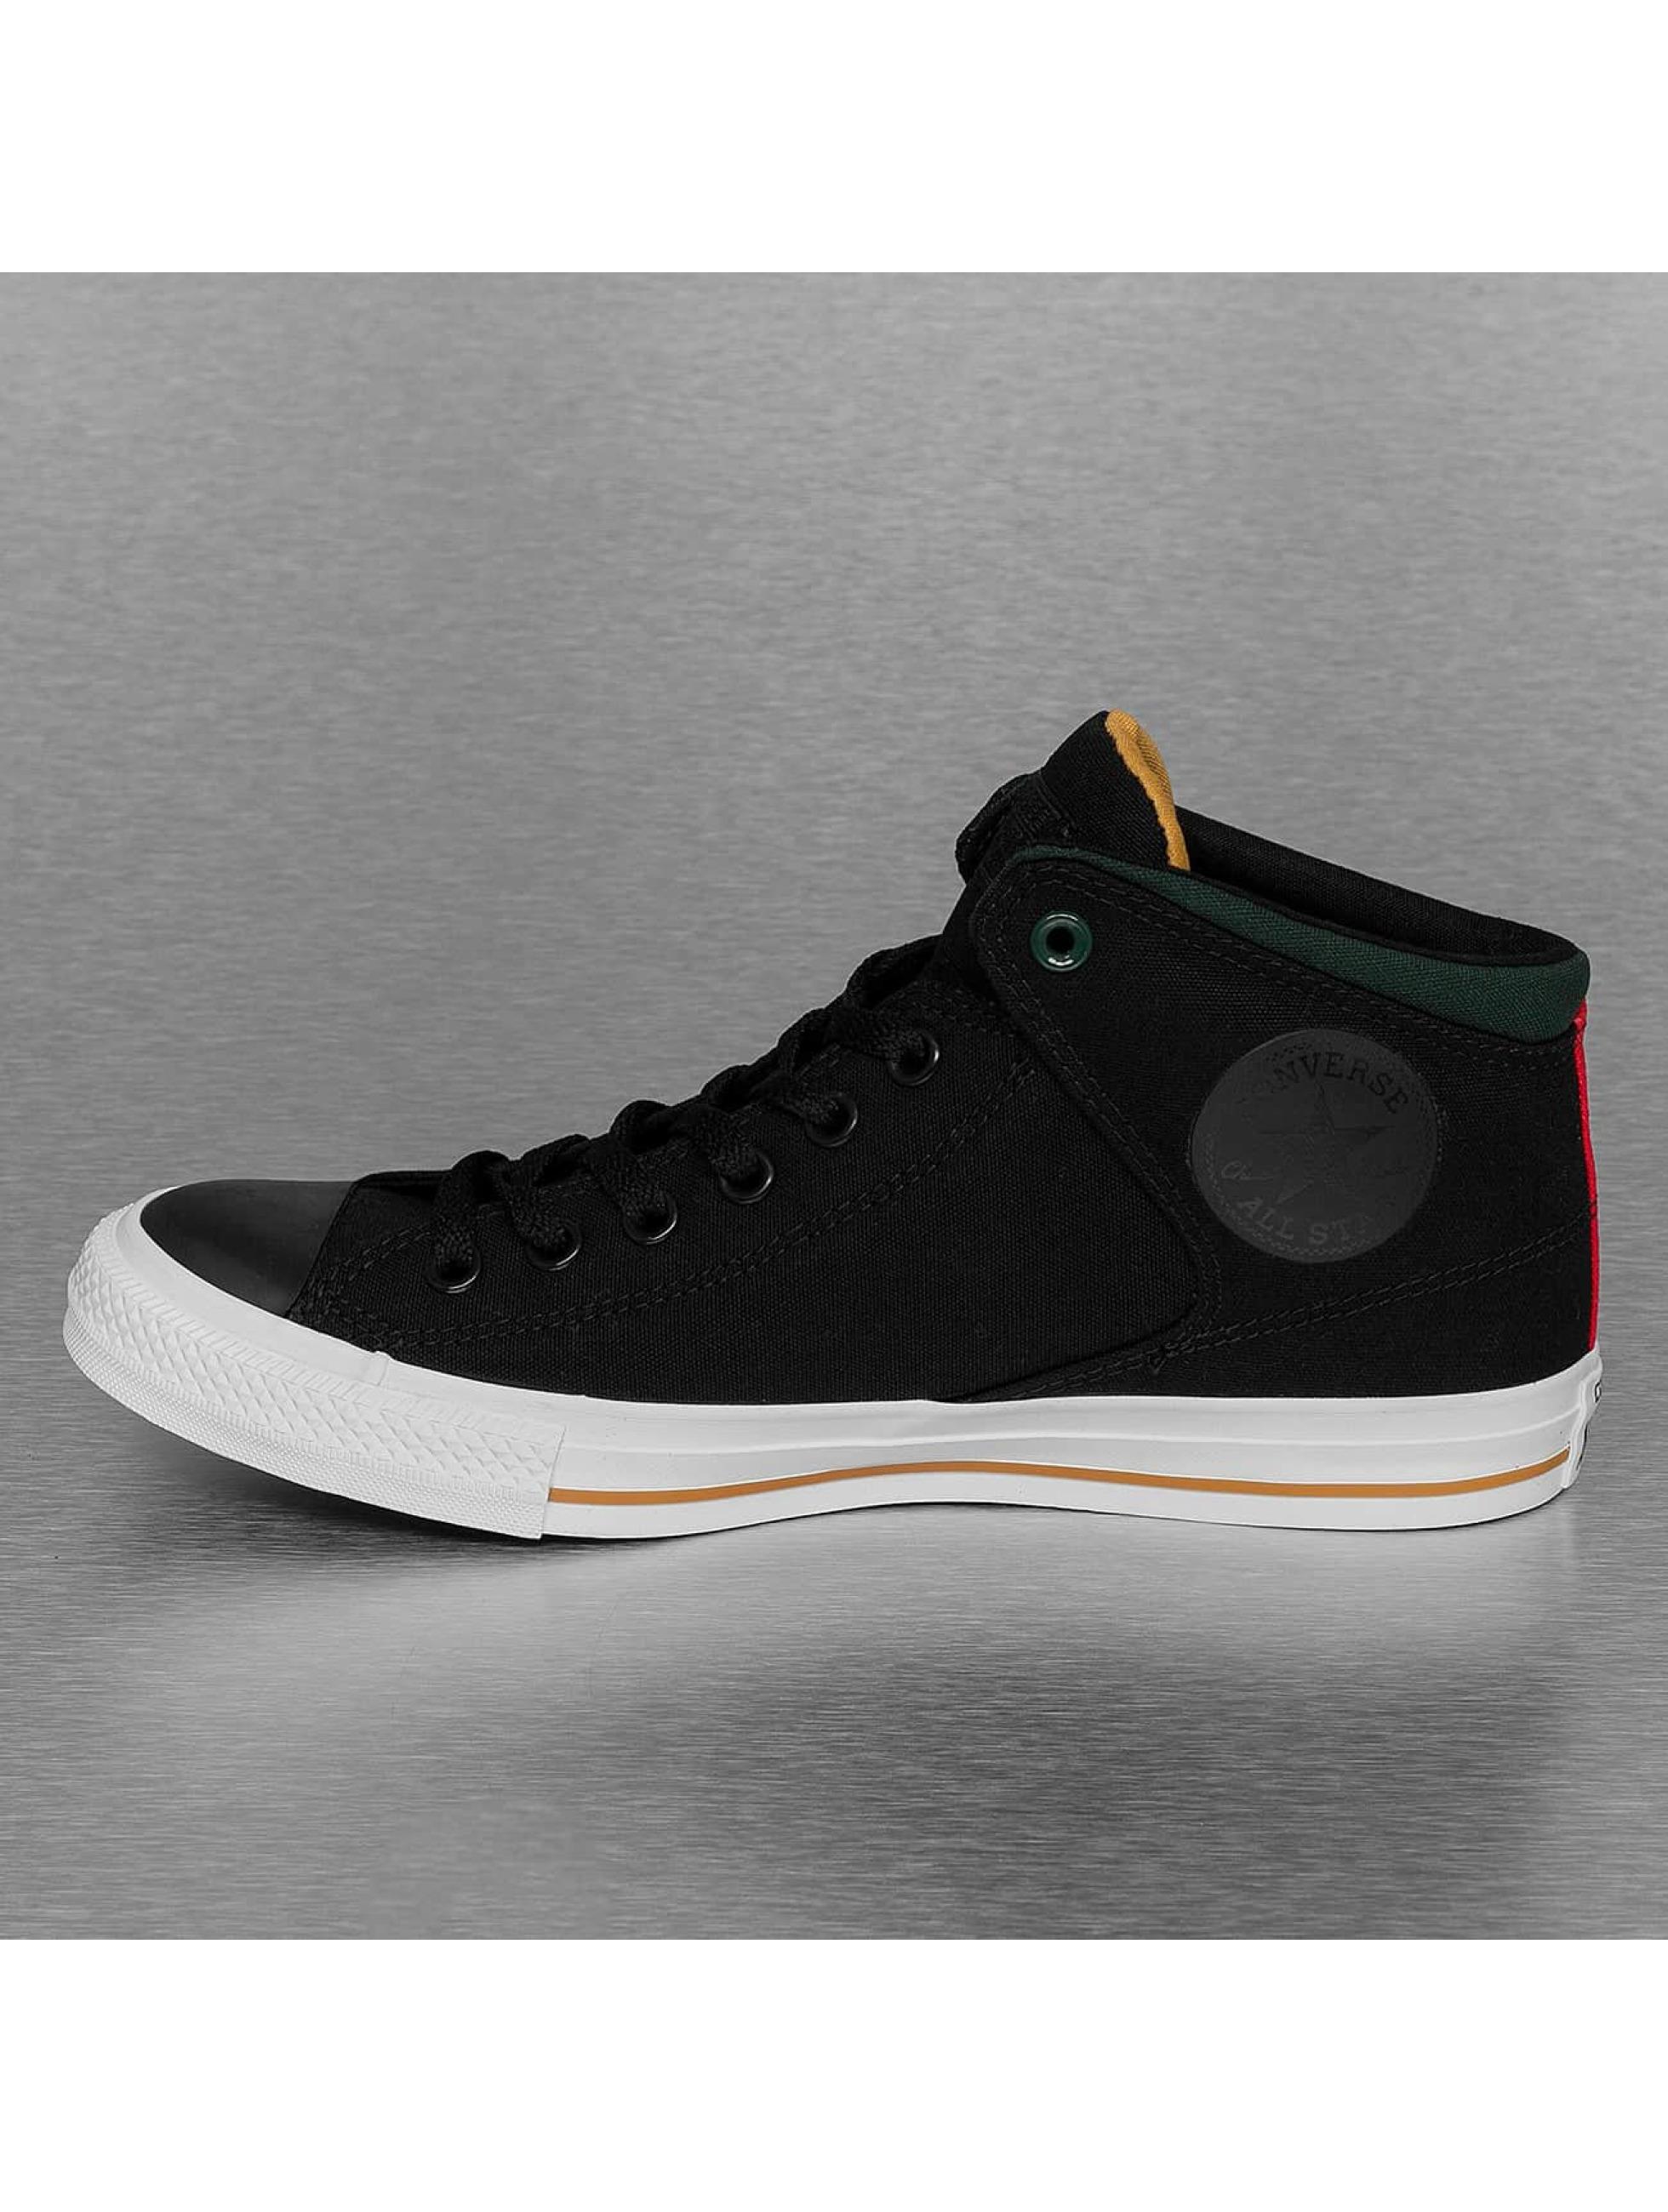 Converse Des Tailles Guide Akileos Chaussures pH1qwq